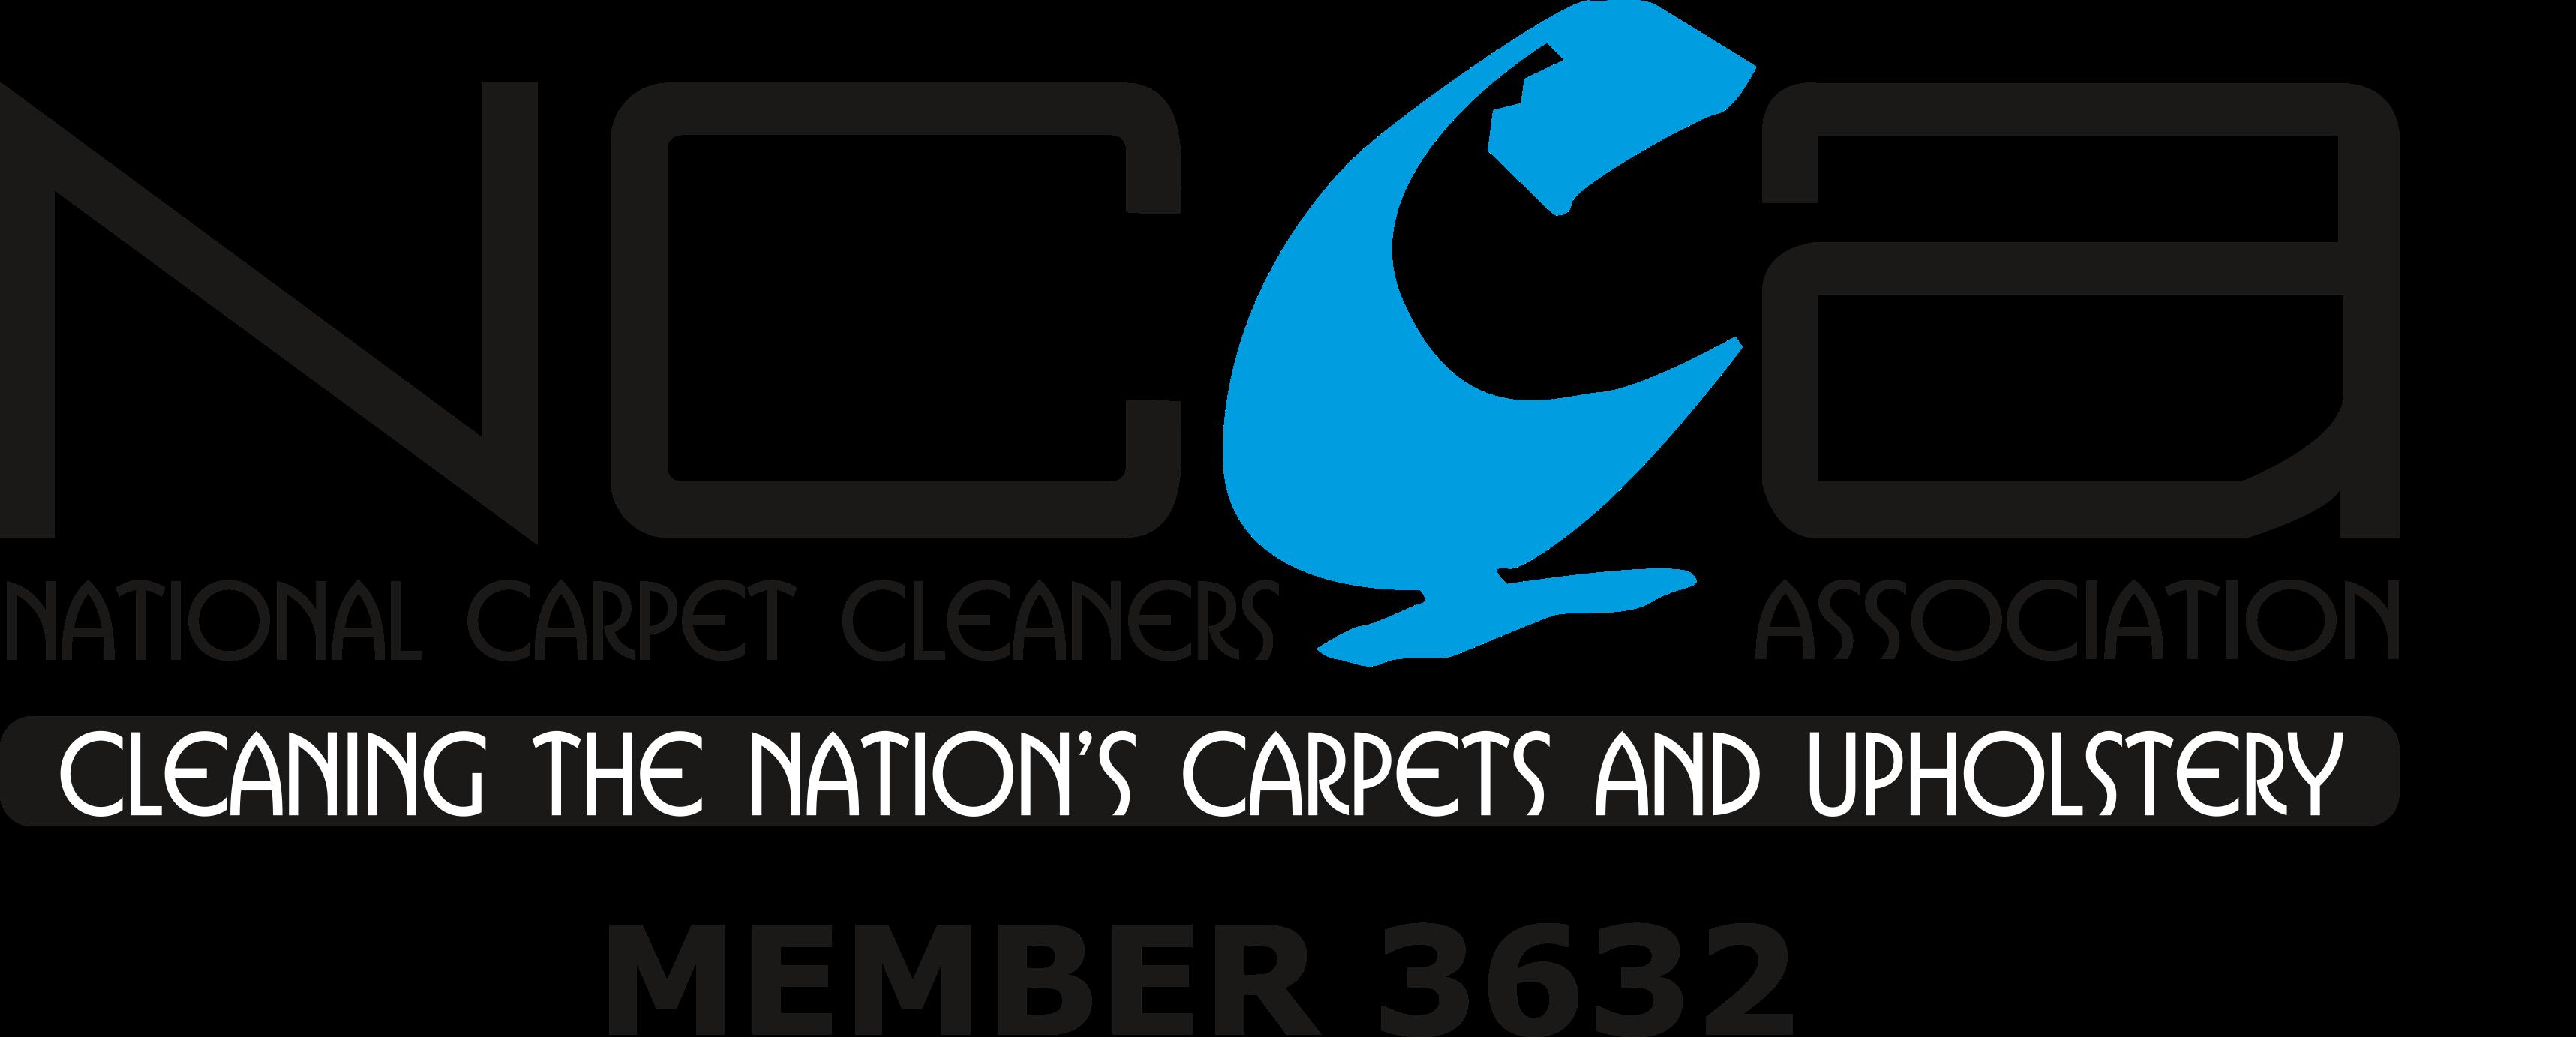 NCCA full membership logo 3632